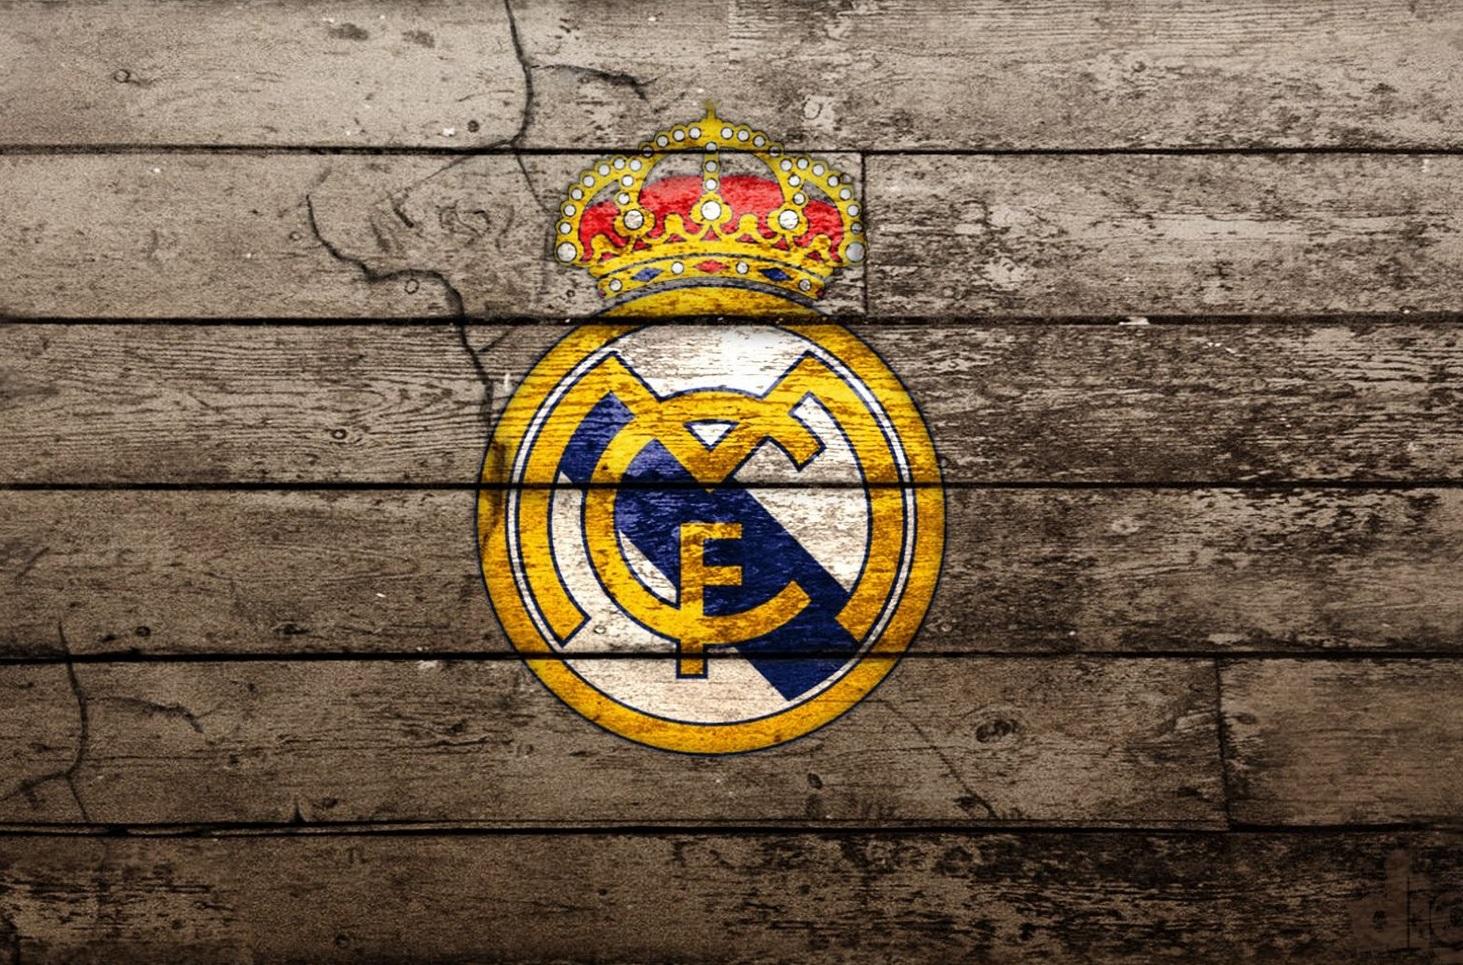 Real madrid fc new hd wallpapers 2013 2014 - Madrid wallpaper ...